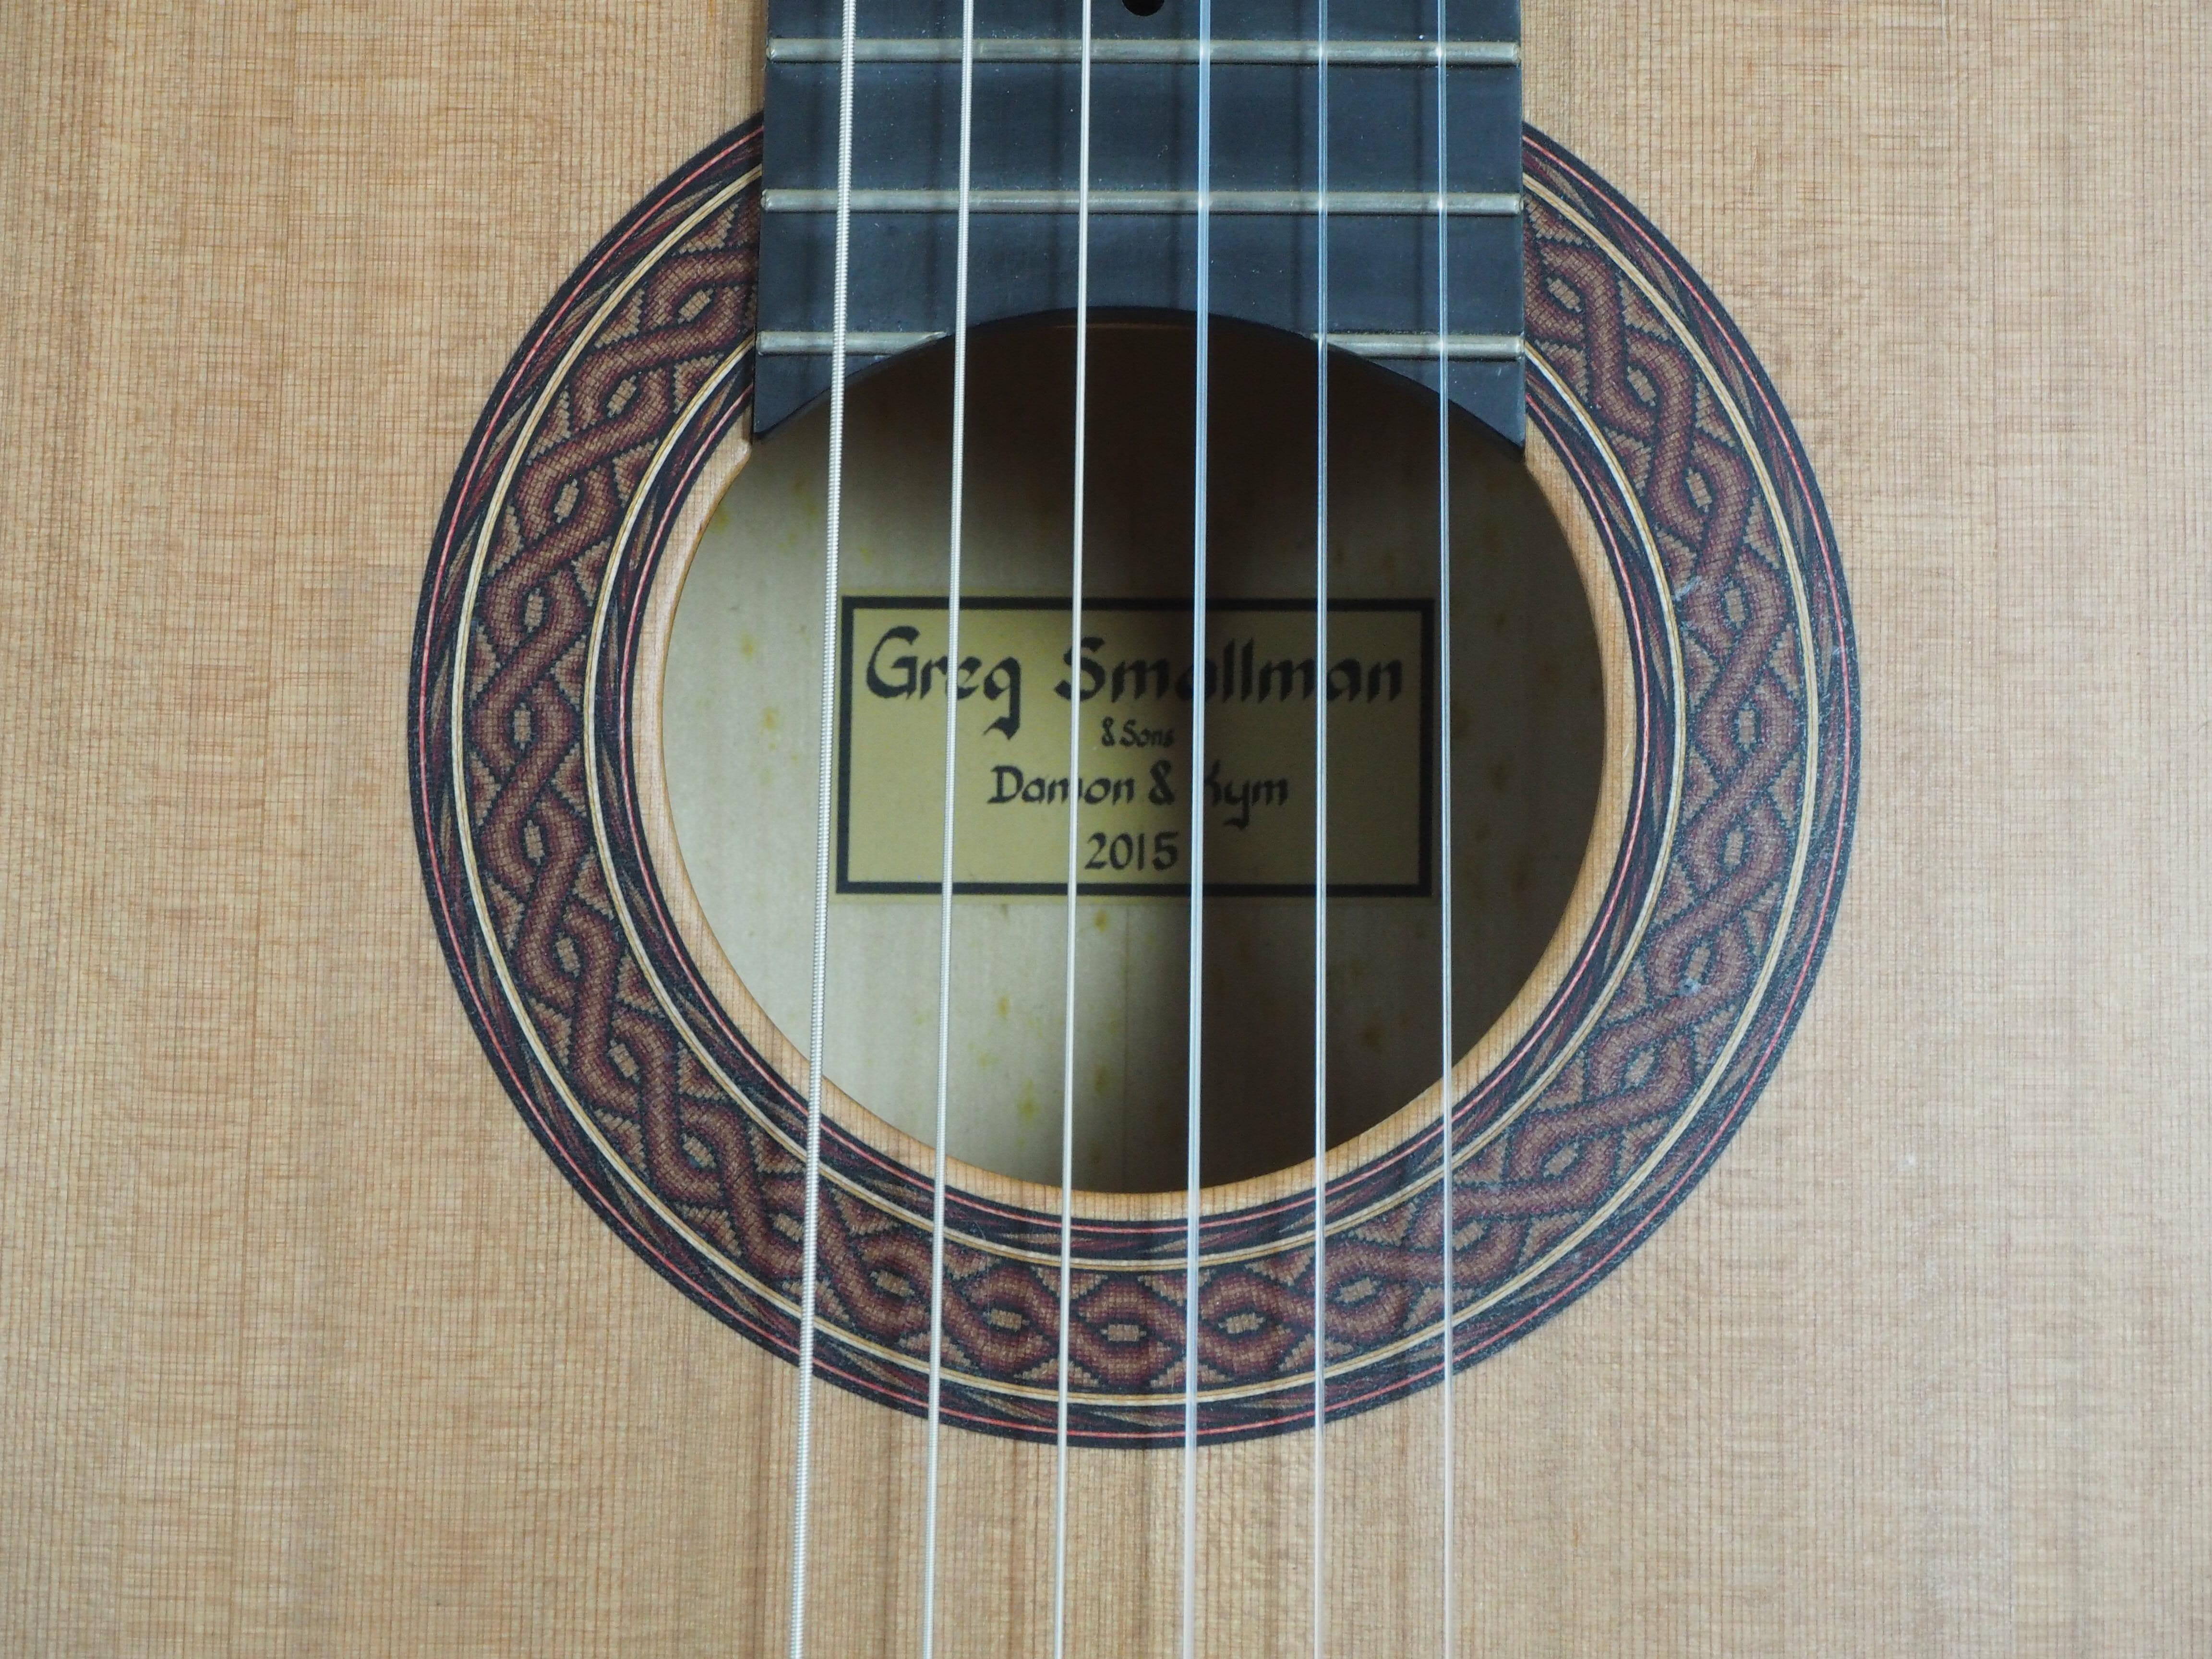 Greg Smallman & sons 2015 guitare classique de concert barrage lattice